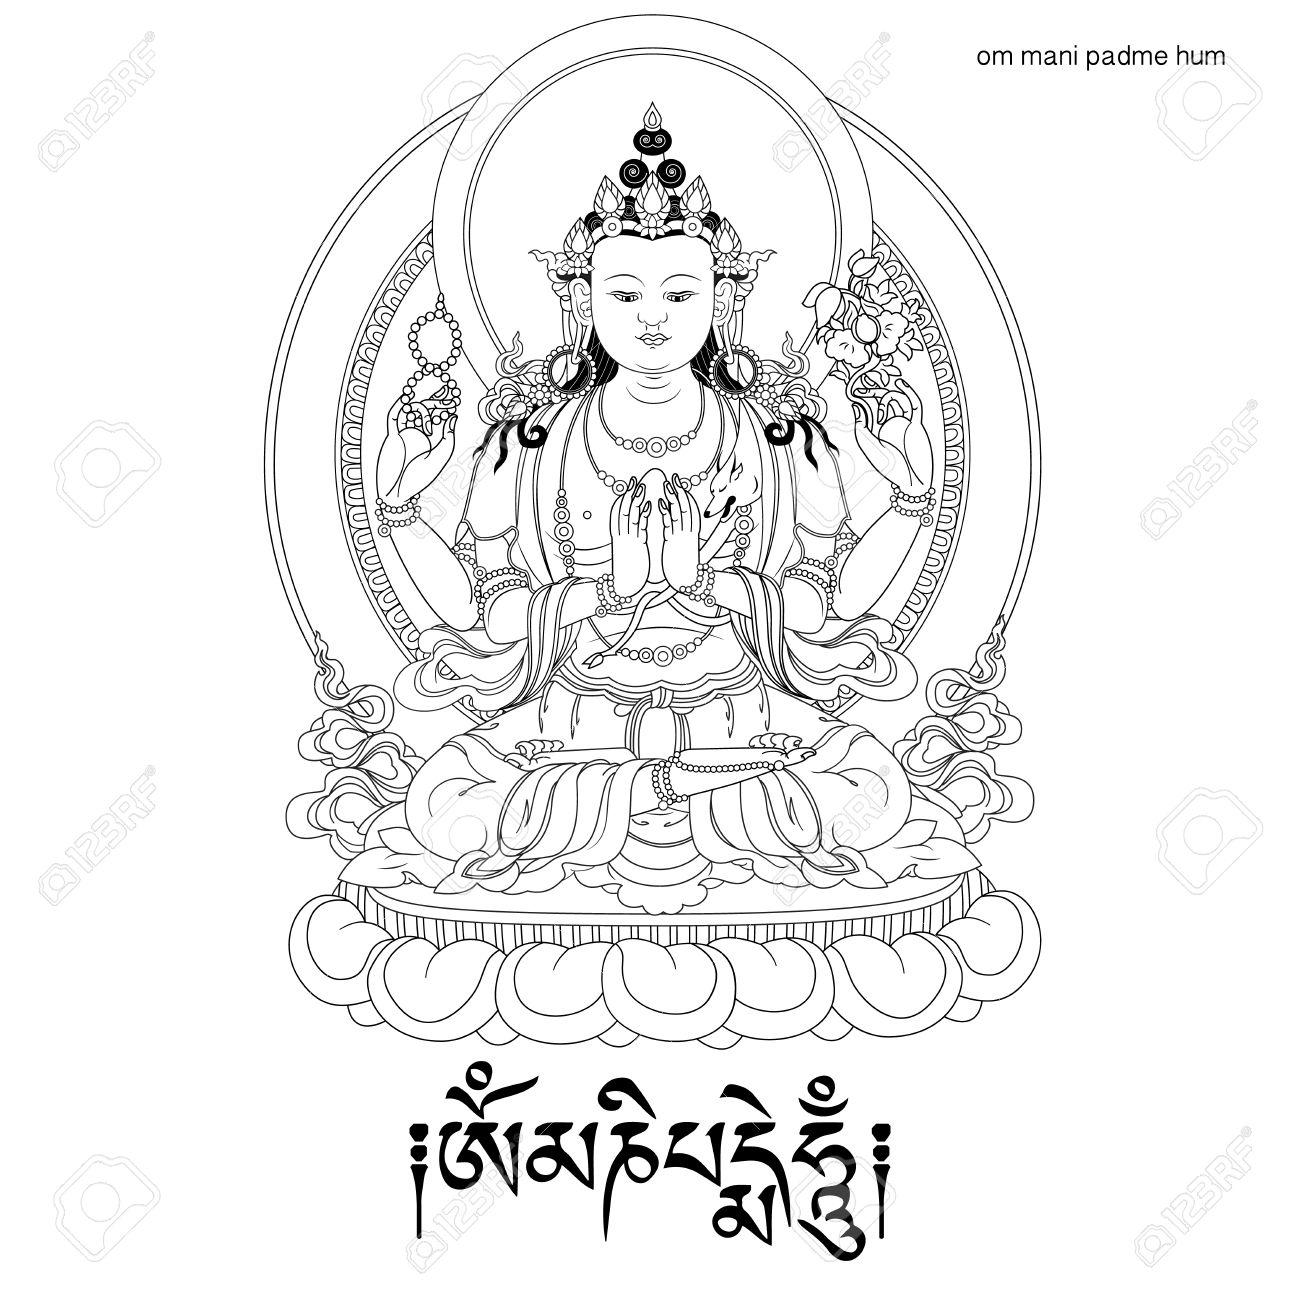 Vector illustration with avalokiteshvara and mantra om mani padme vector illustration with avalokiteshvara and mantra om mani padme hum bodhisattva who embodies the compassion buycottarizona